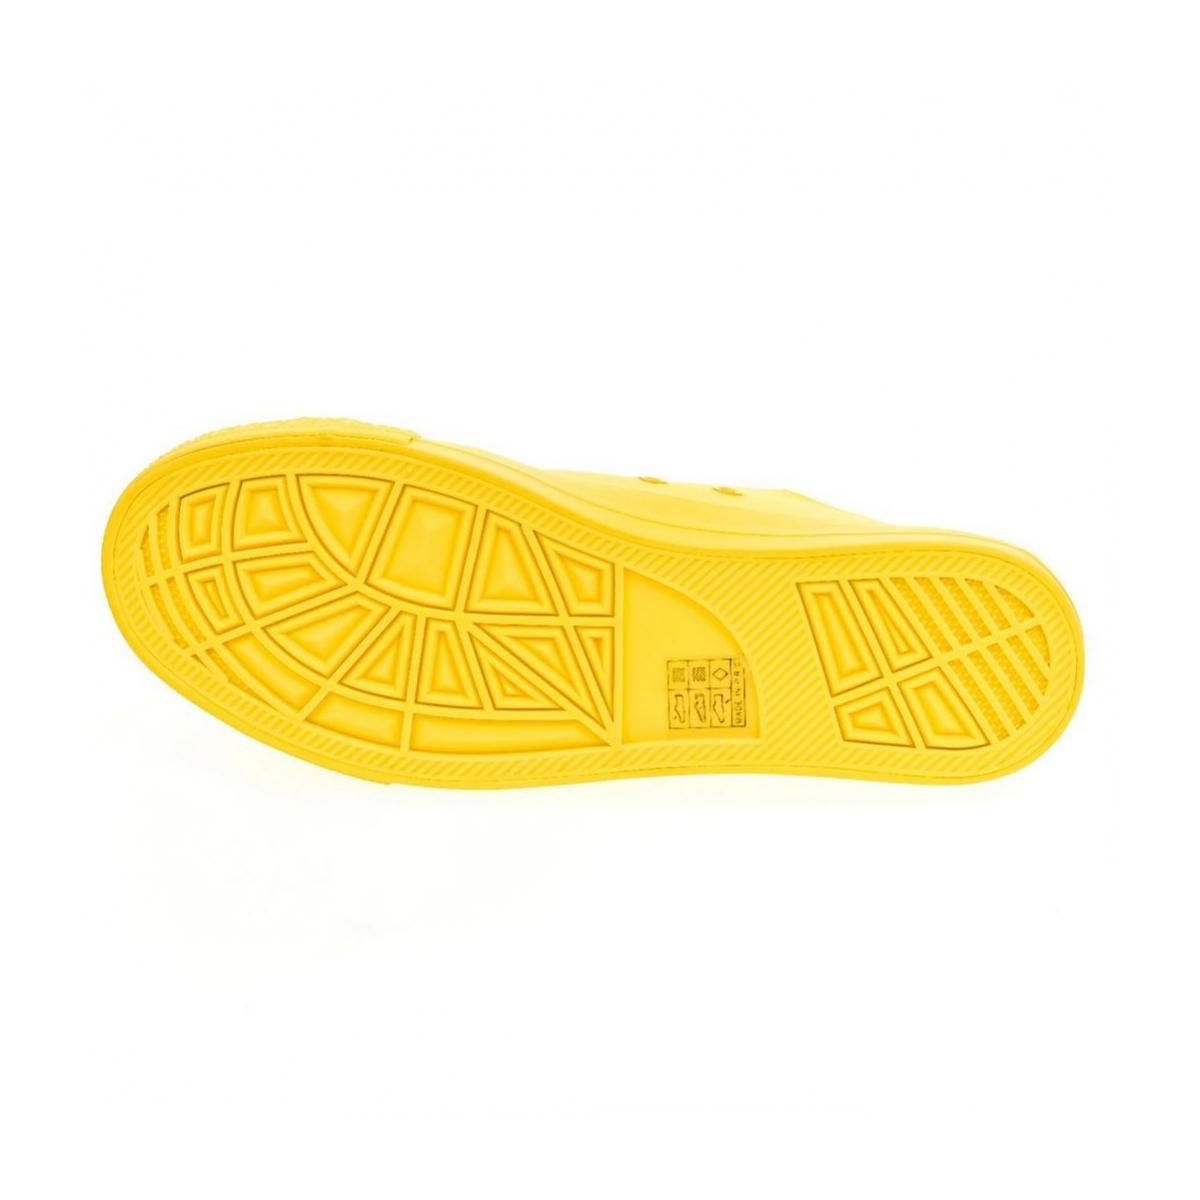 5e75e39759aa6 Dámske žlté tenisky REINA | Johnc.sk